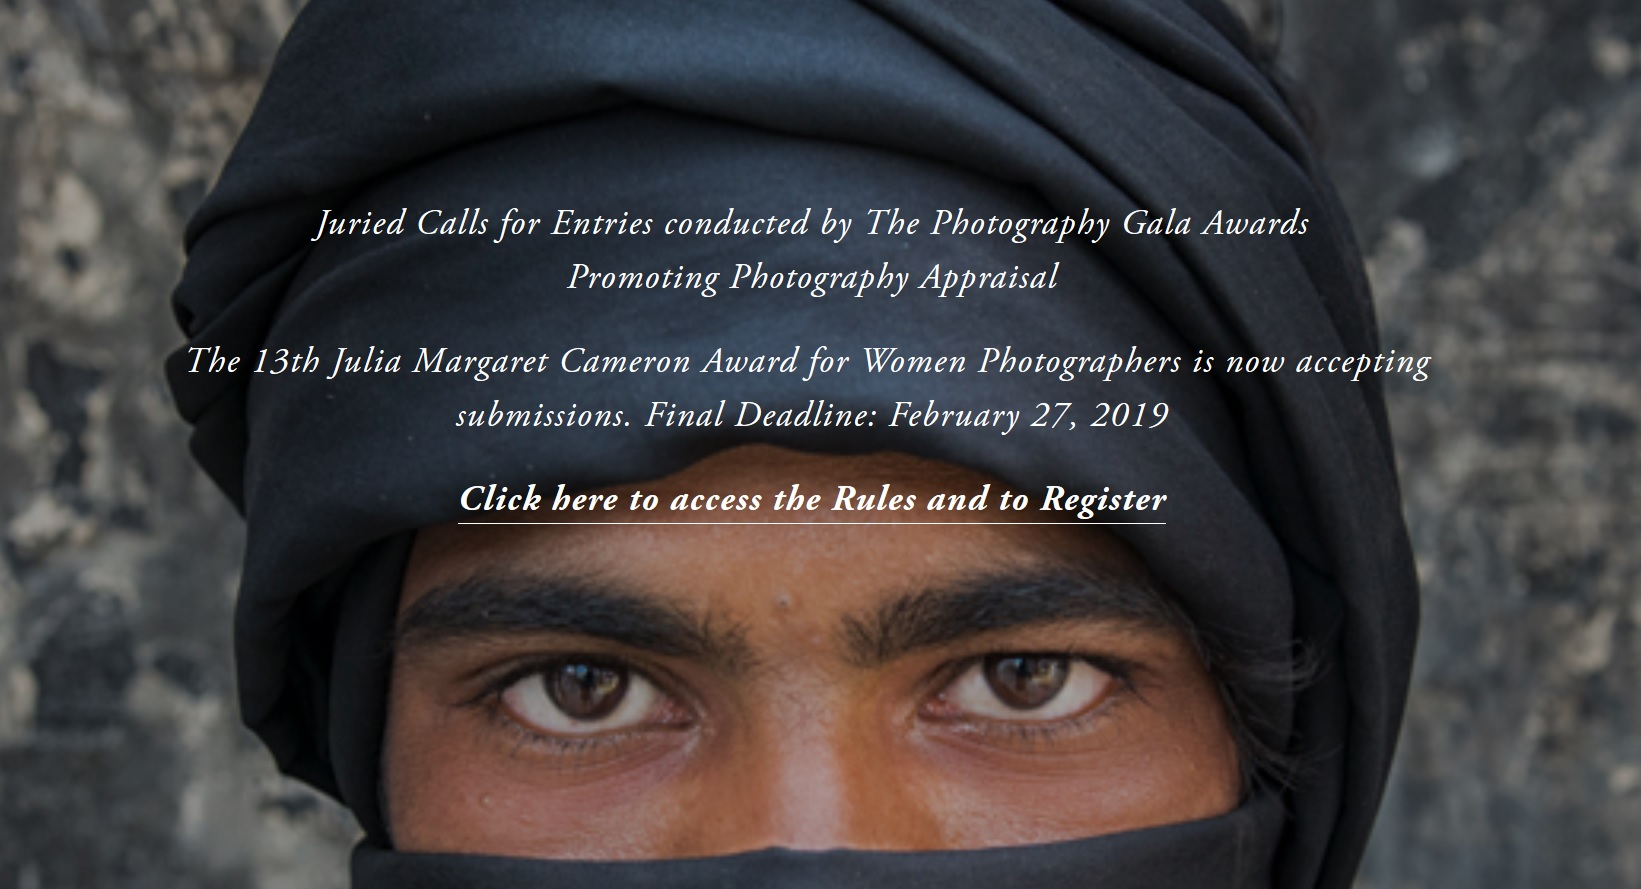 13th Julia Margaret Cameron Award for Women Photographers 2019 - logo